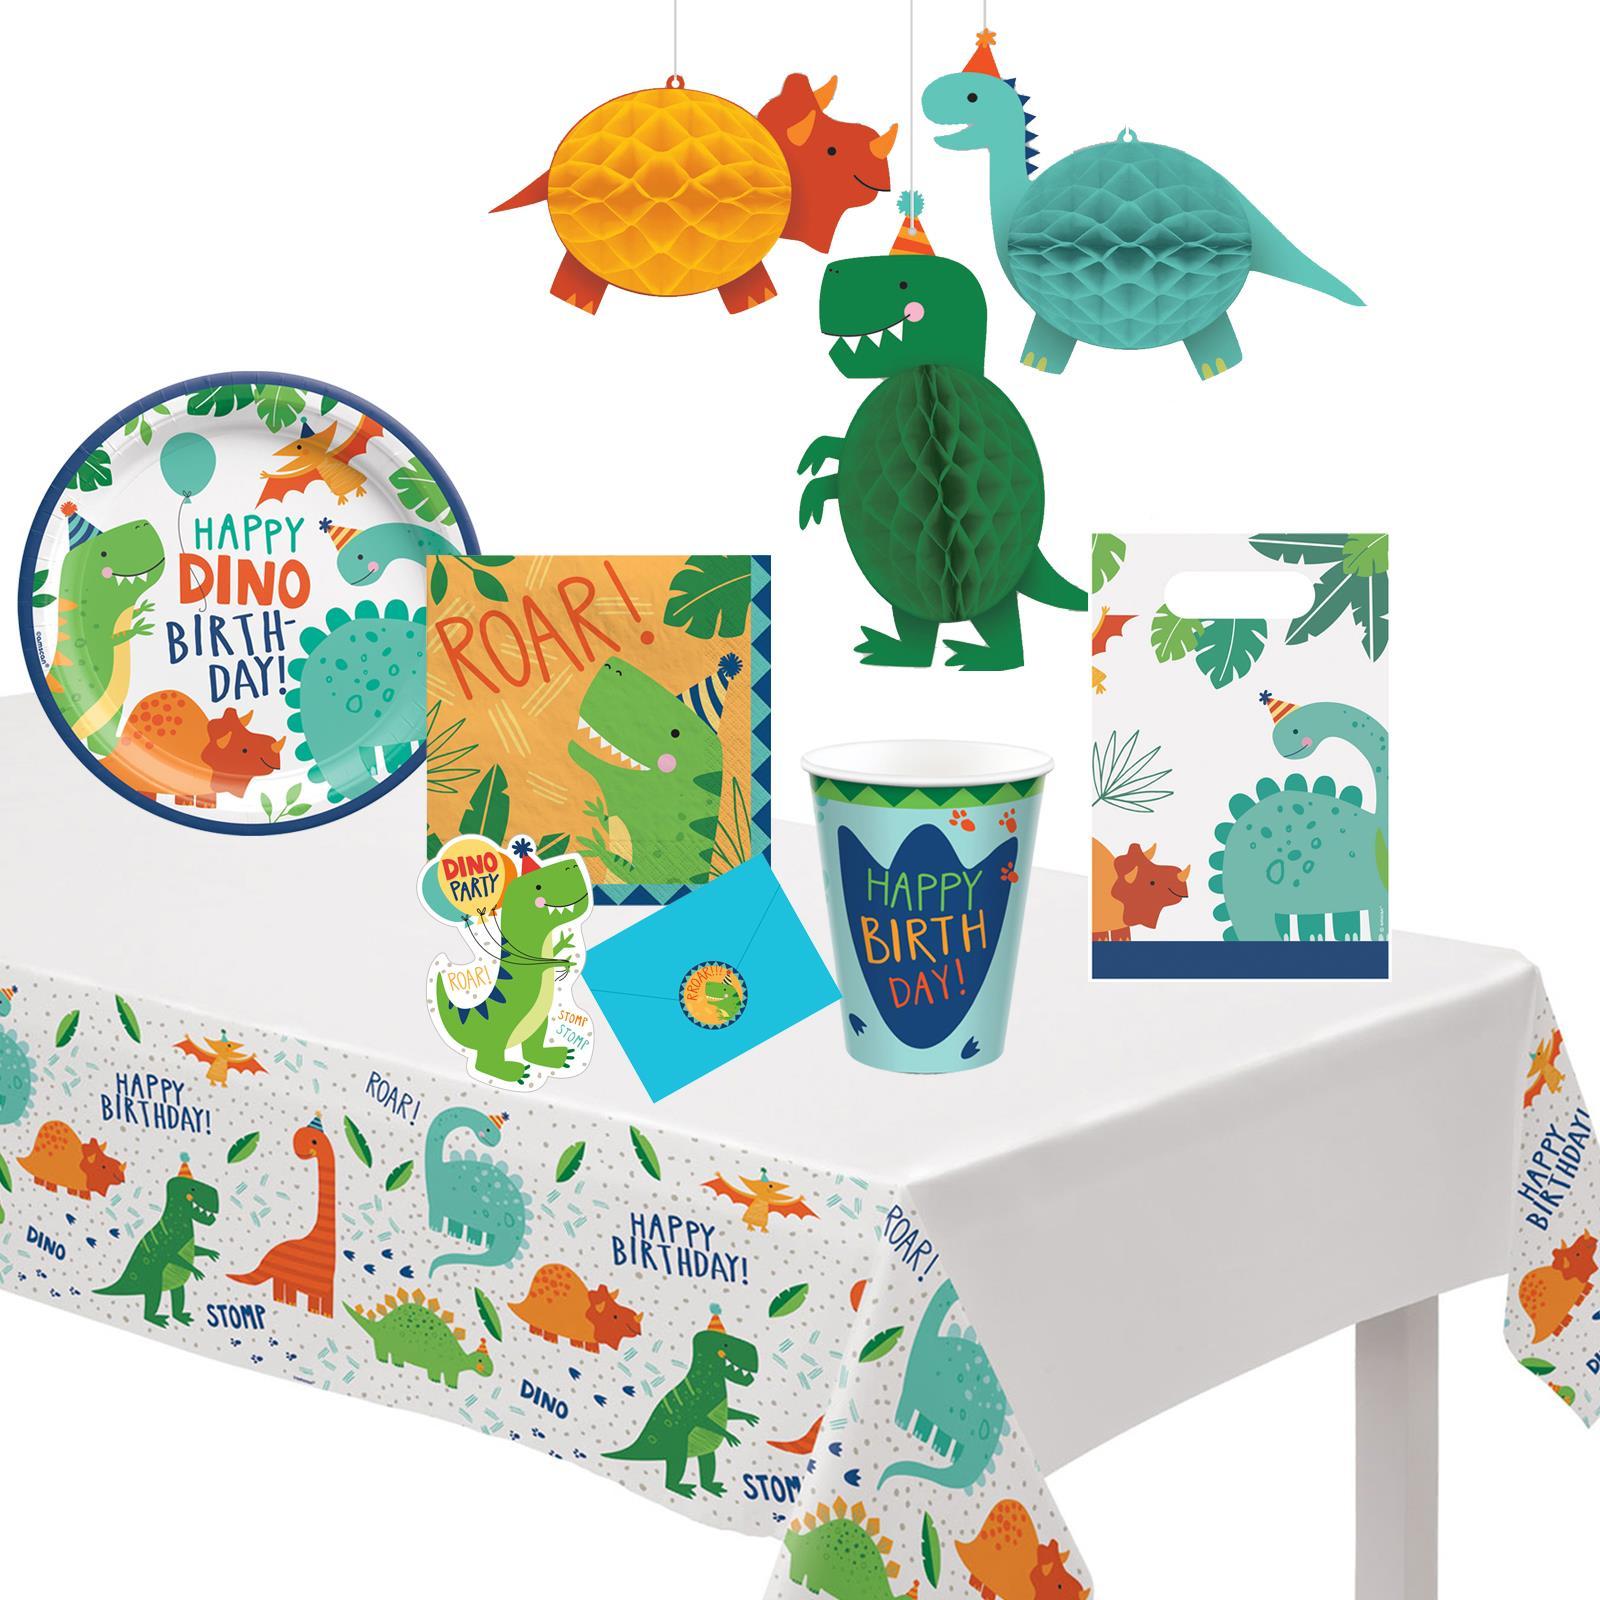 Amycute Dinosaur Disposable Tableware Birthday Party Supplies with Dinosaur Slap Bracelets Plates Cups Napkins Knifes Forks Straws balloon Dinosaur 3D Stickers Serves 8 for Boys,Girls,Baby Showers Birthday Party Favors Decorations- Party Supplies Dinosaur